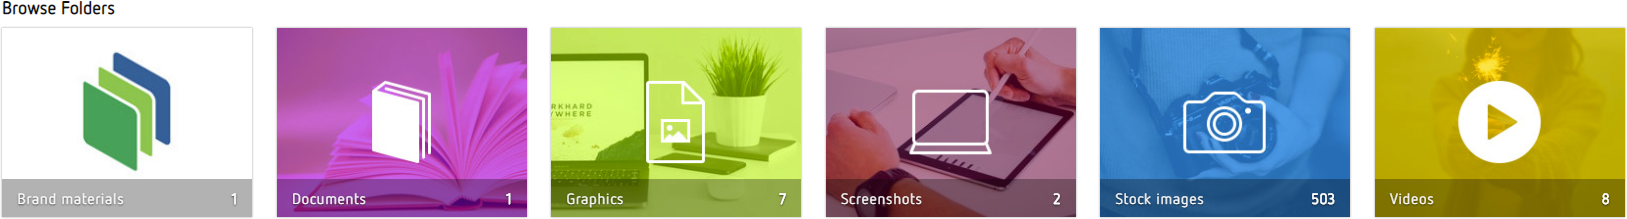 Image-Icons